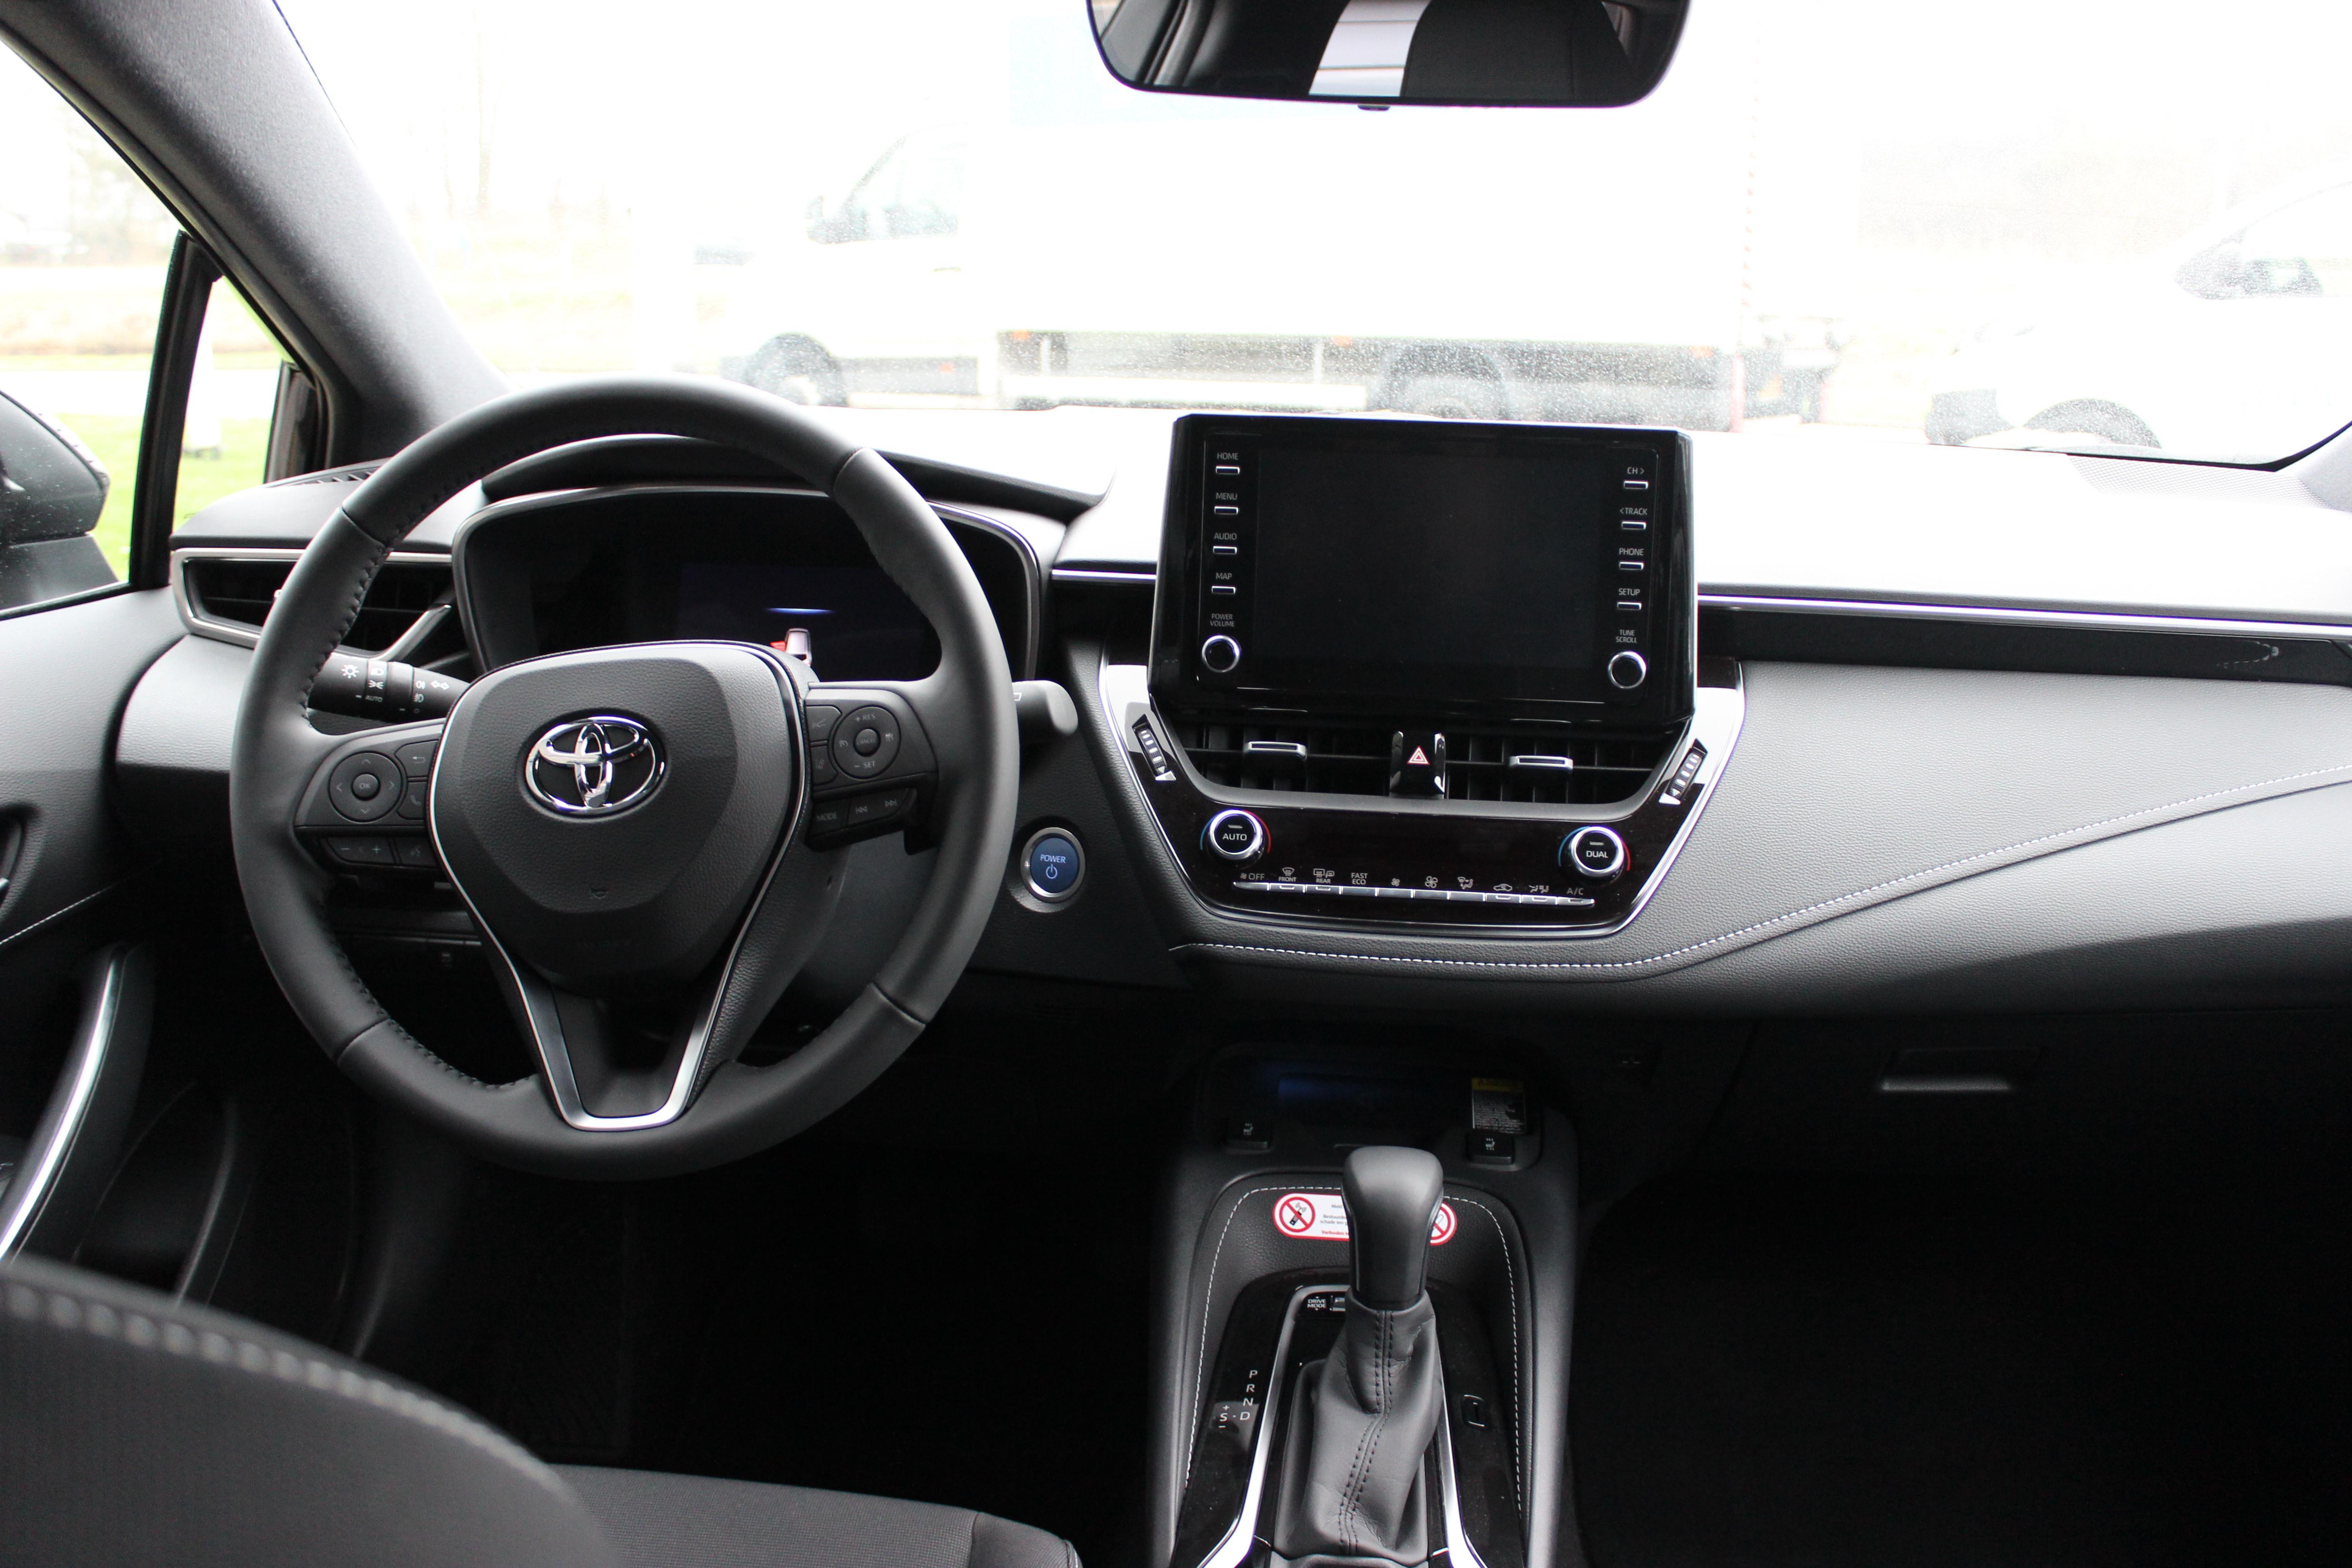 Toyota Corolla TS Hybrid 2.0 dashboard